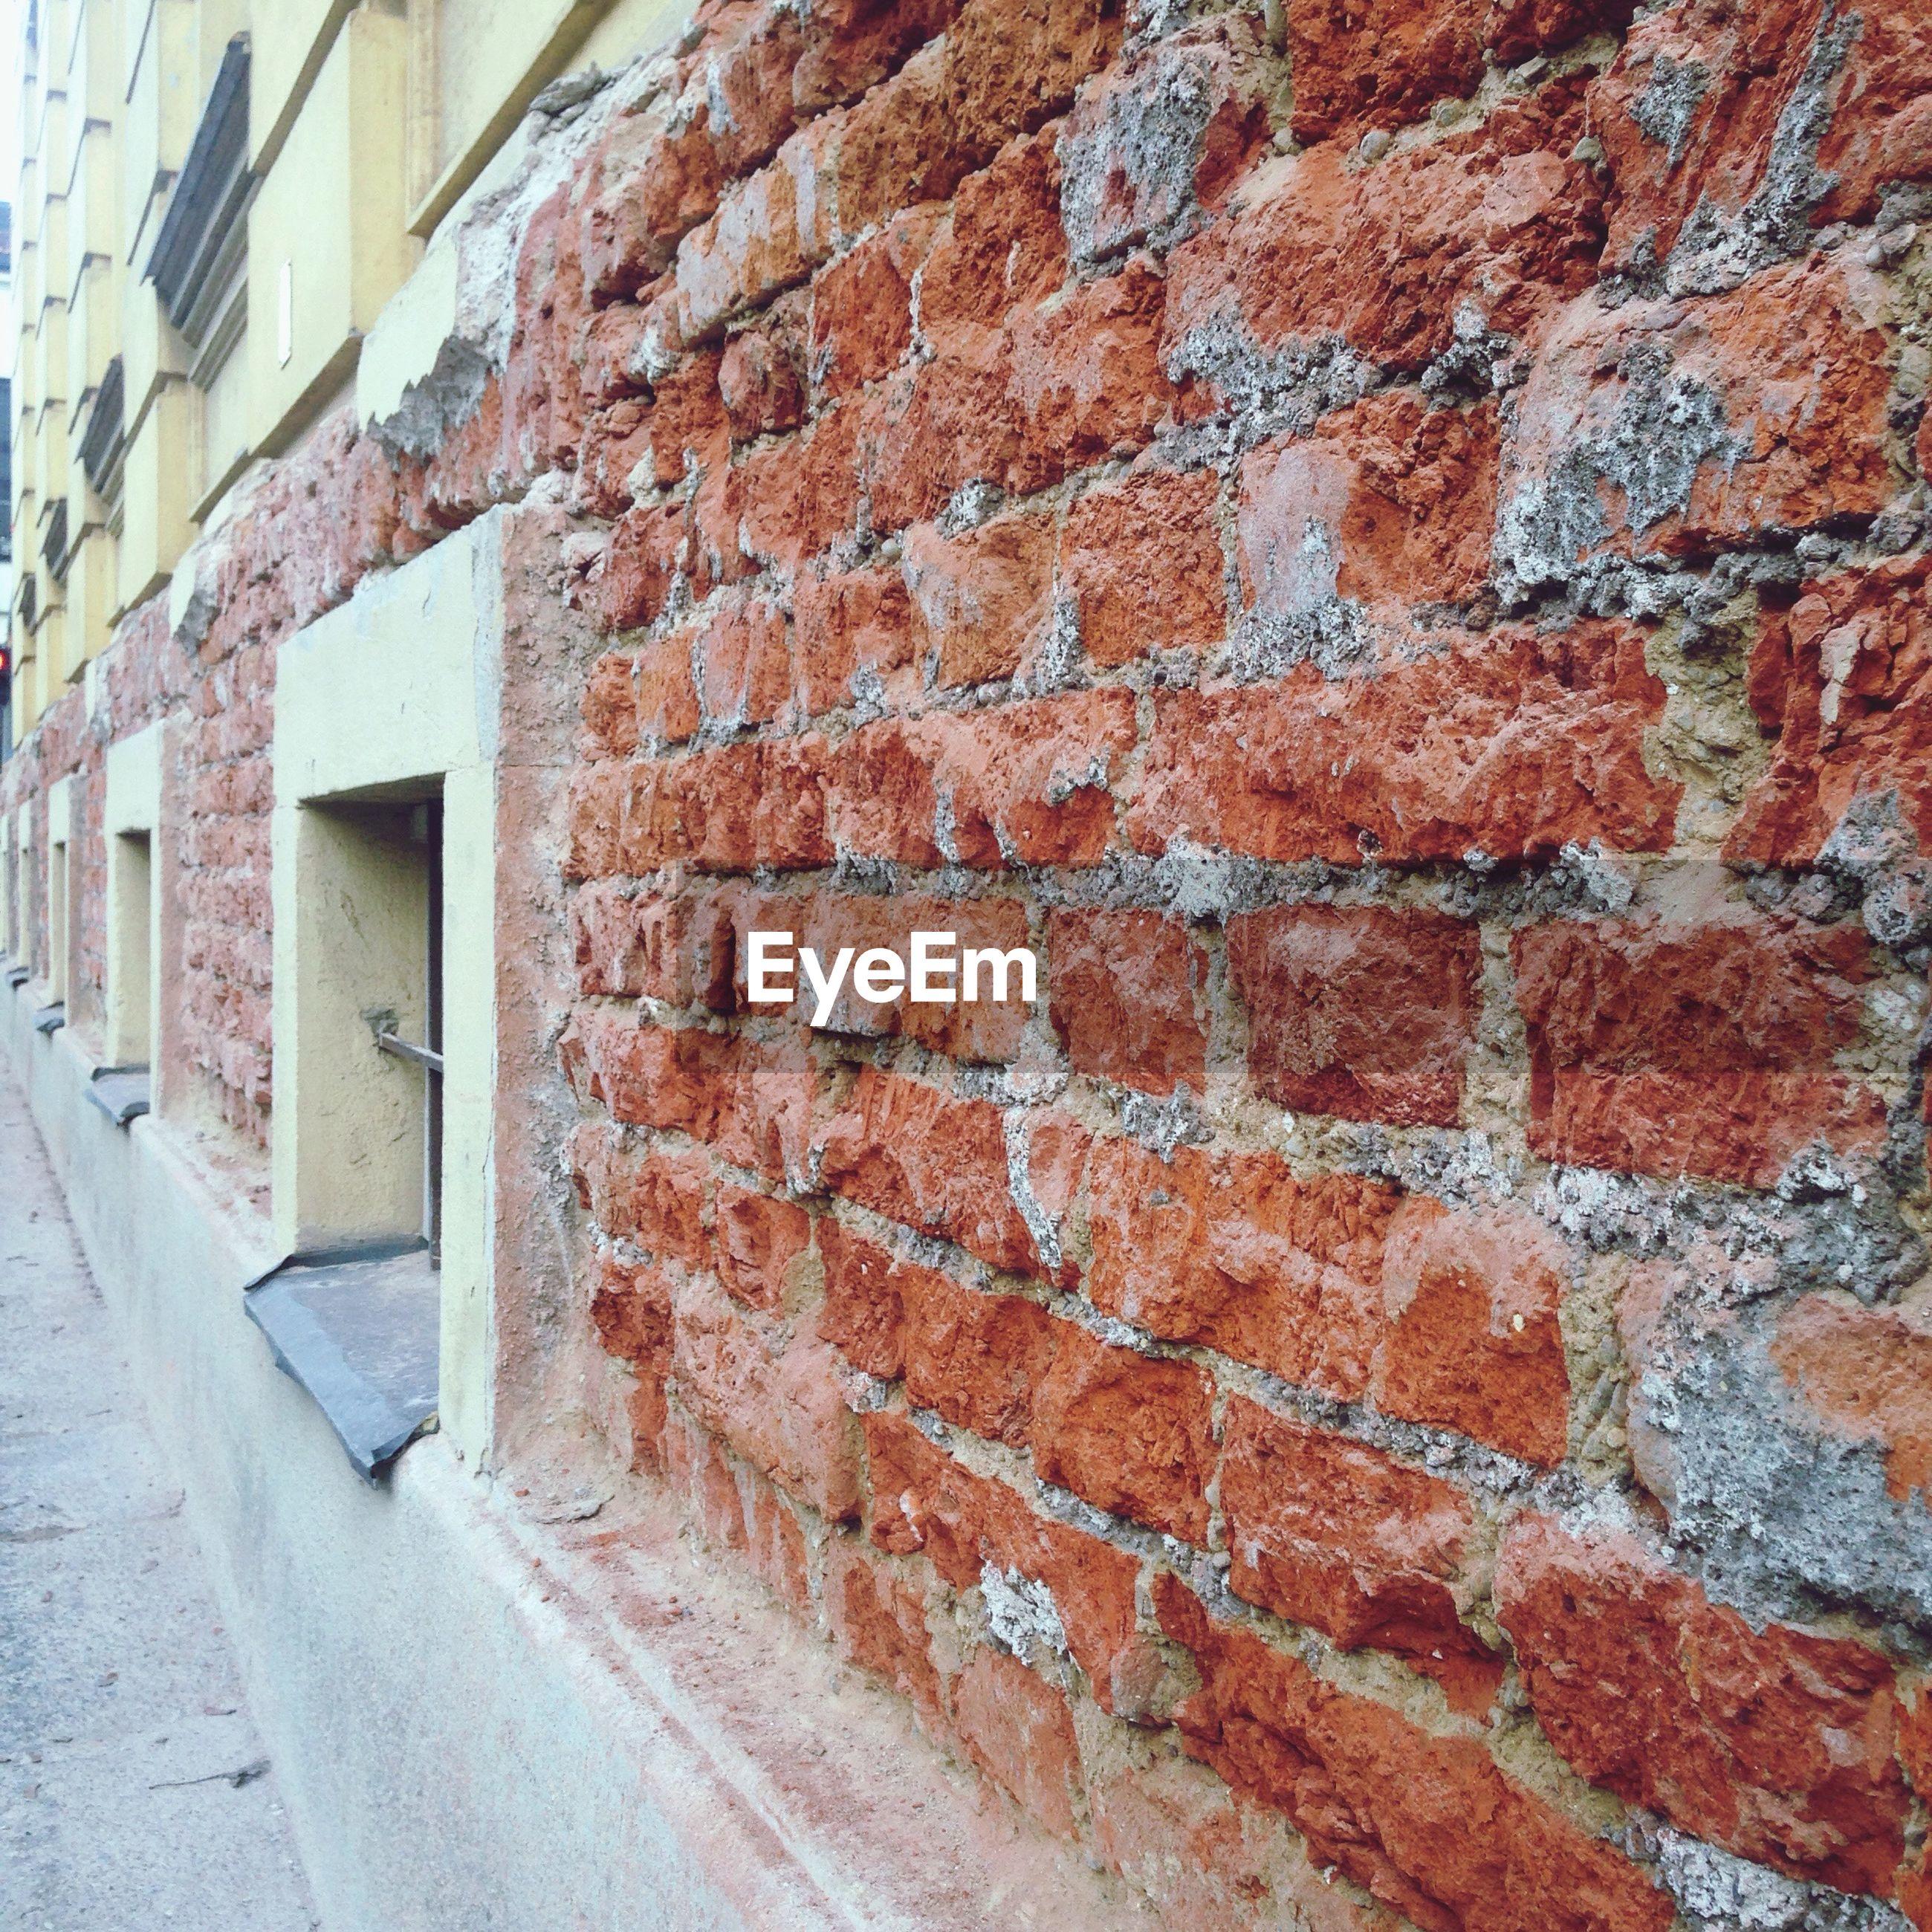 Brick wall by walkway